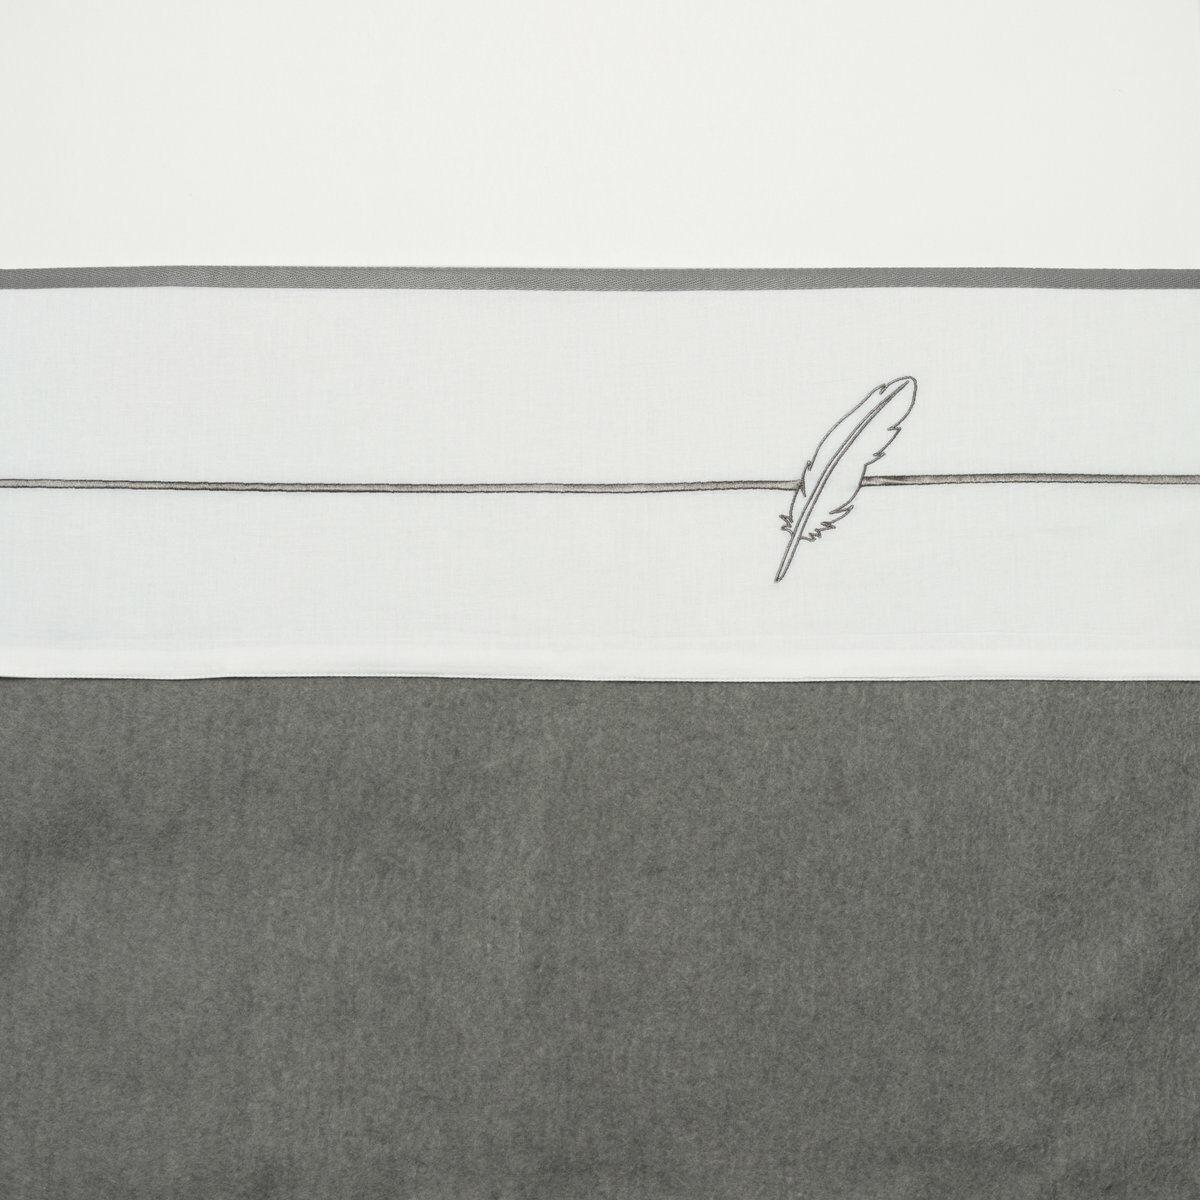 Meyco Ledikantlaken Feathers Grijs 100 x 150 cm